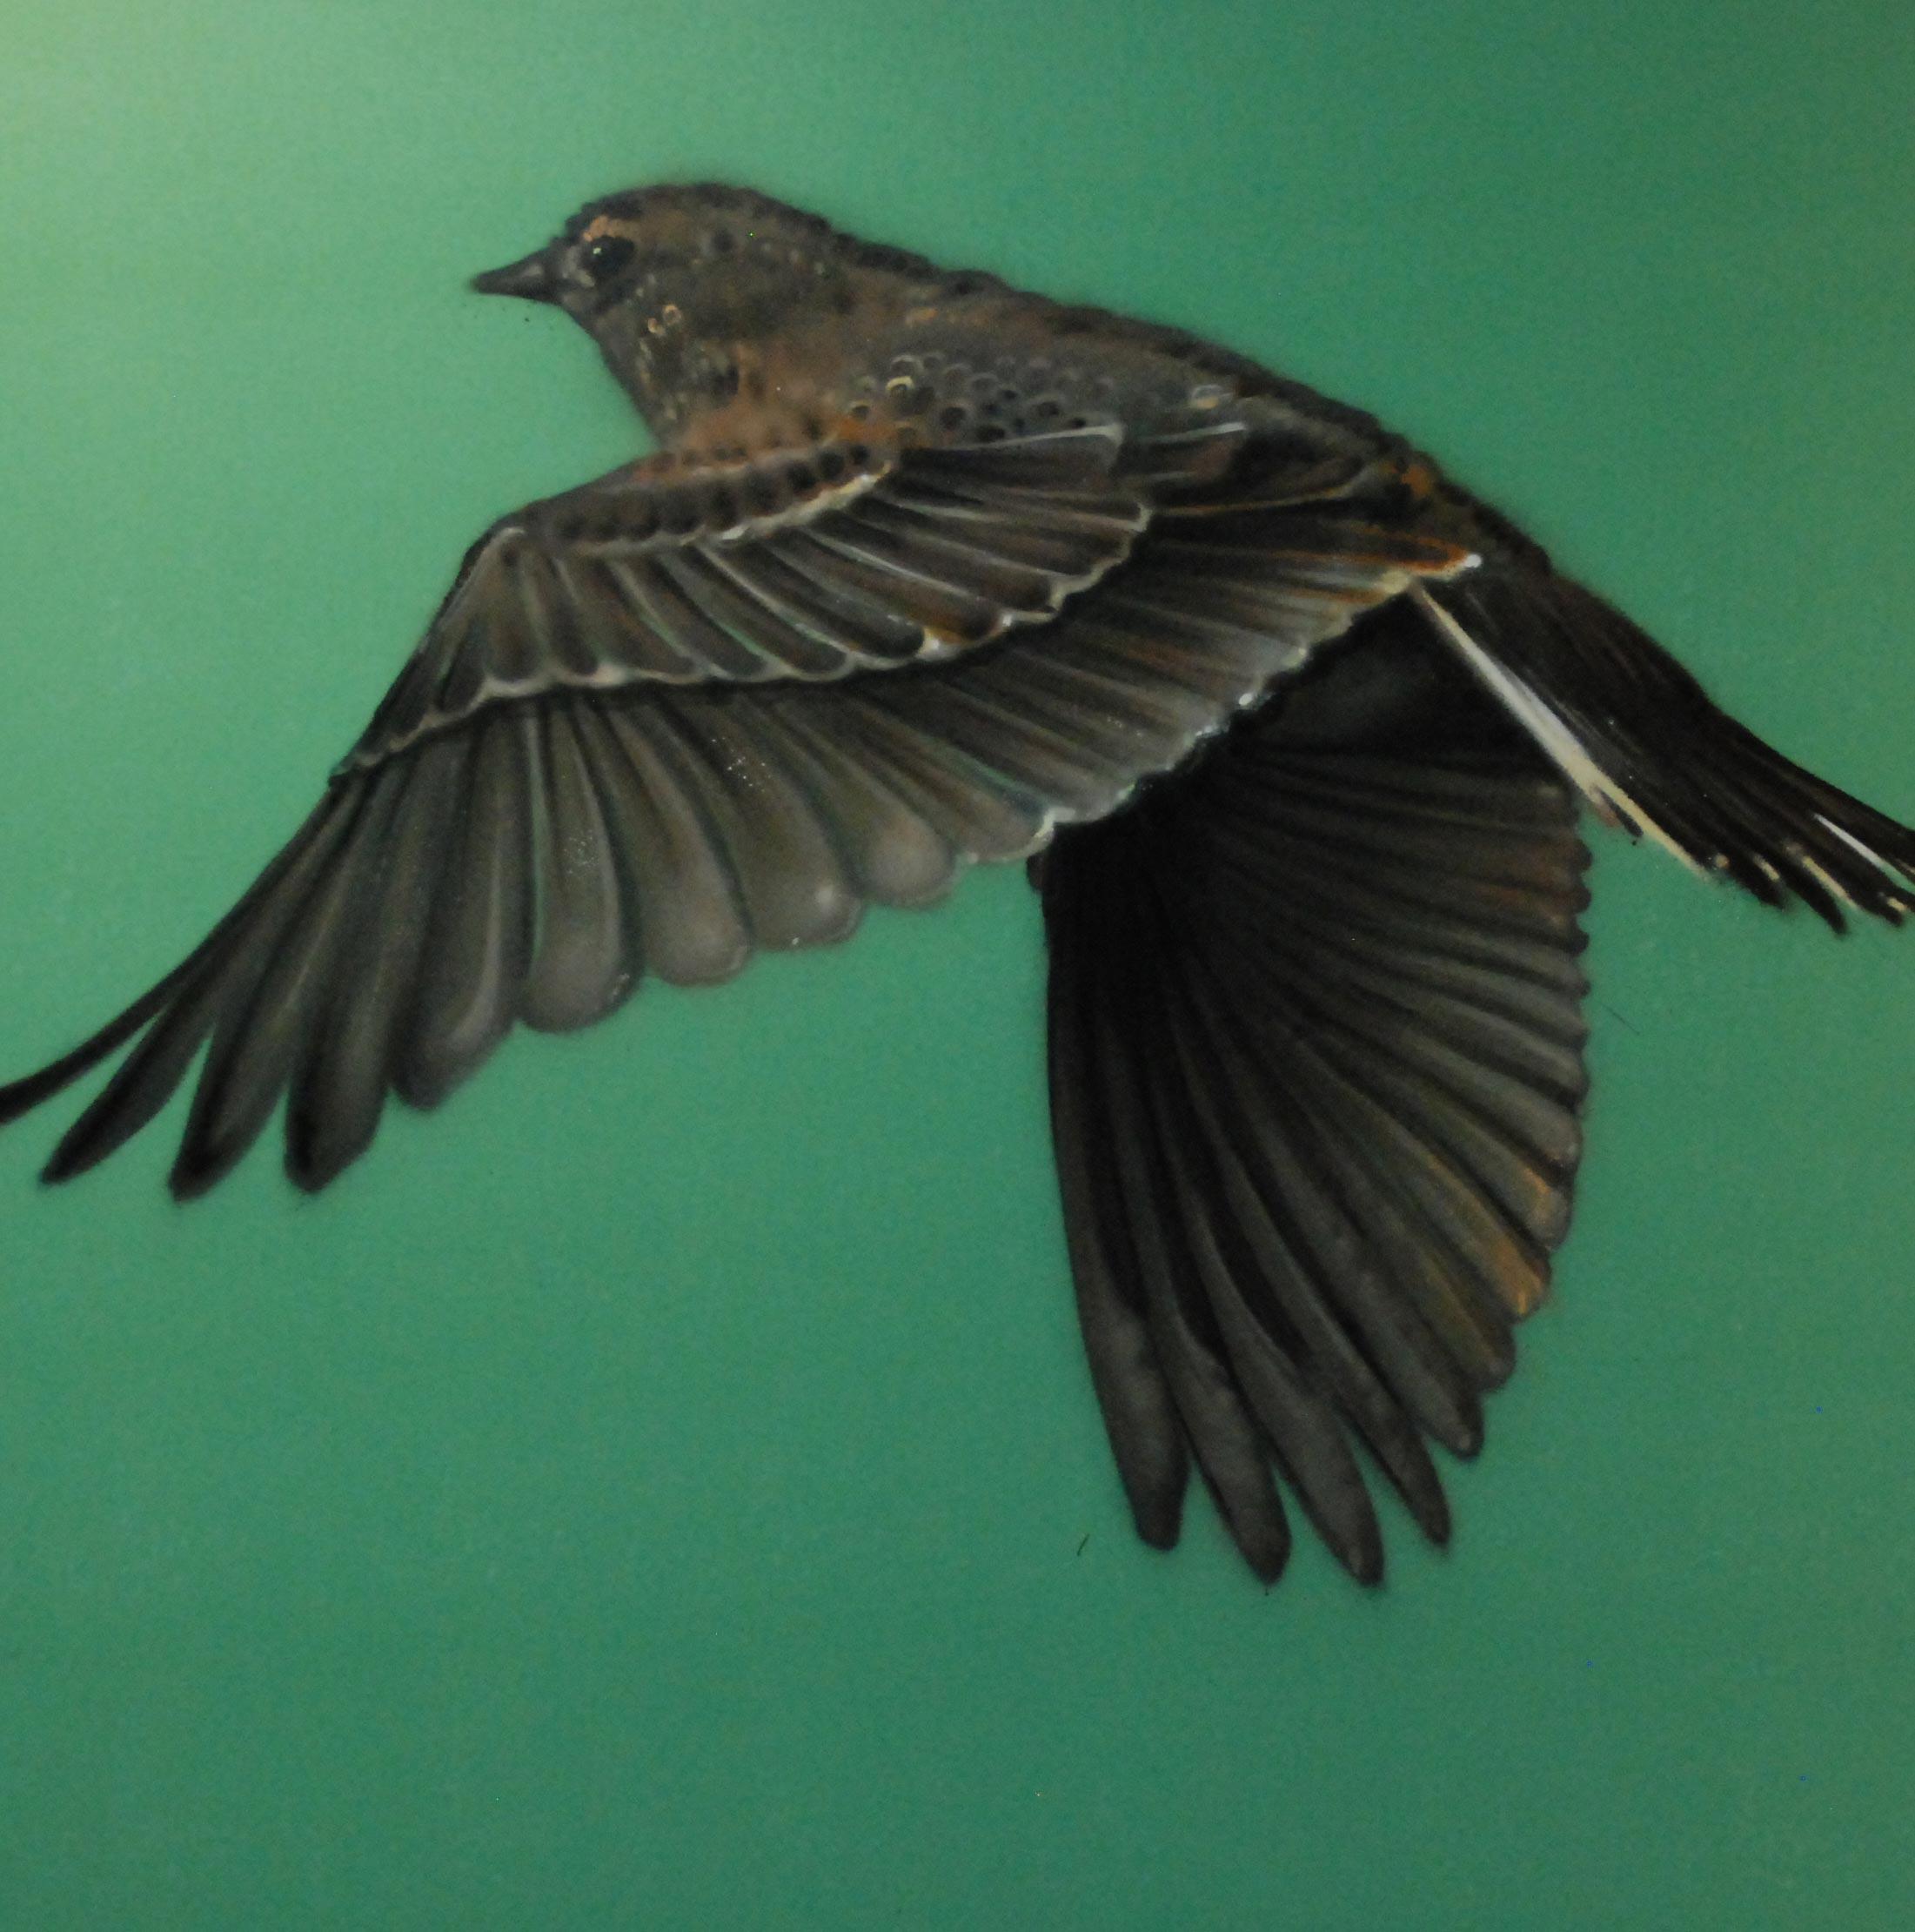 arpi fly away